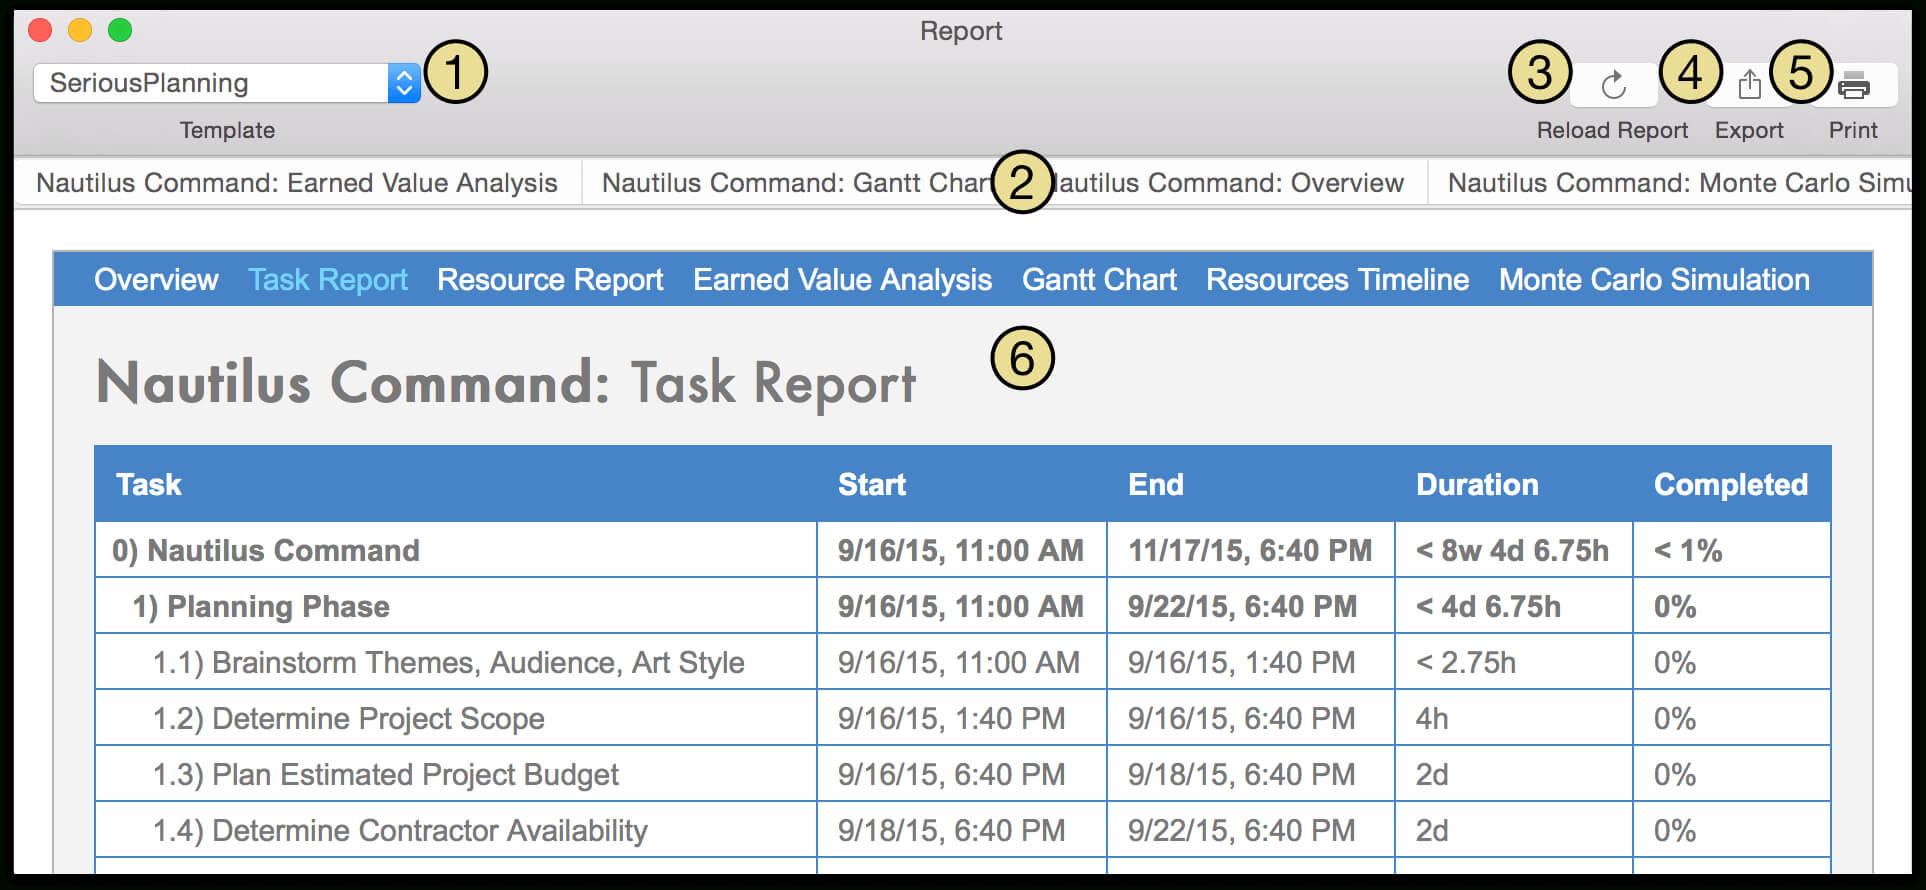 Omniplan 3 For Mac User Manual - Reporting And Printing inside Html Report Template Download